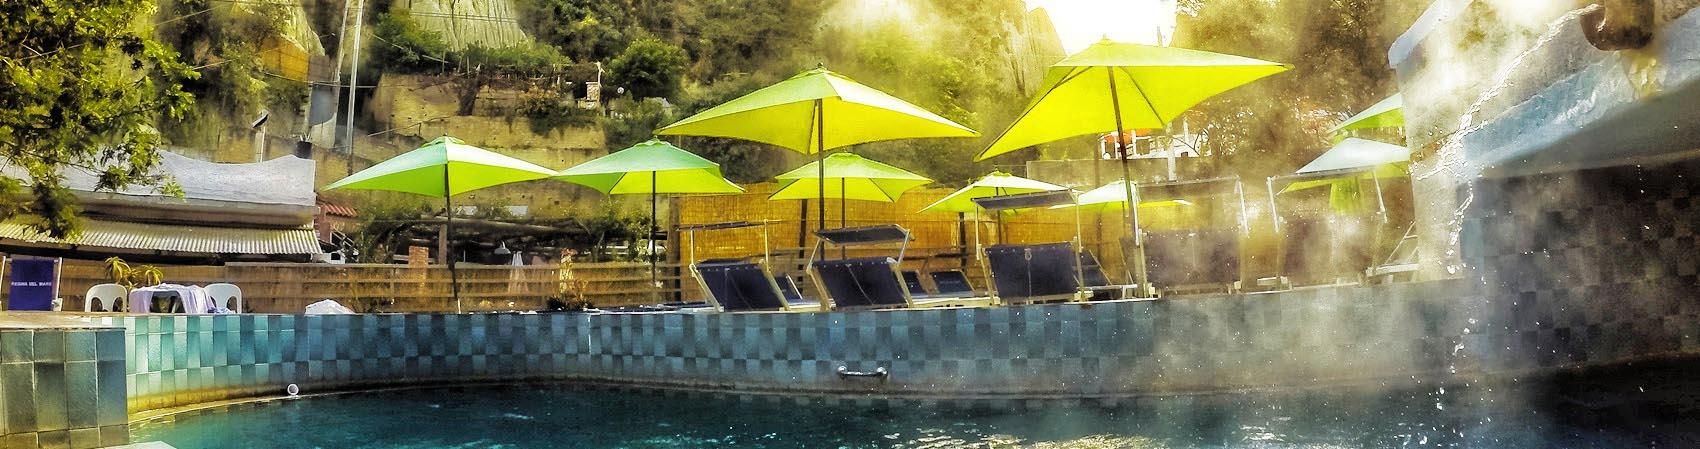 Hotel-Barano-Ischia-Sauna-piscina-termale